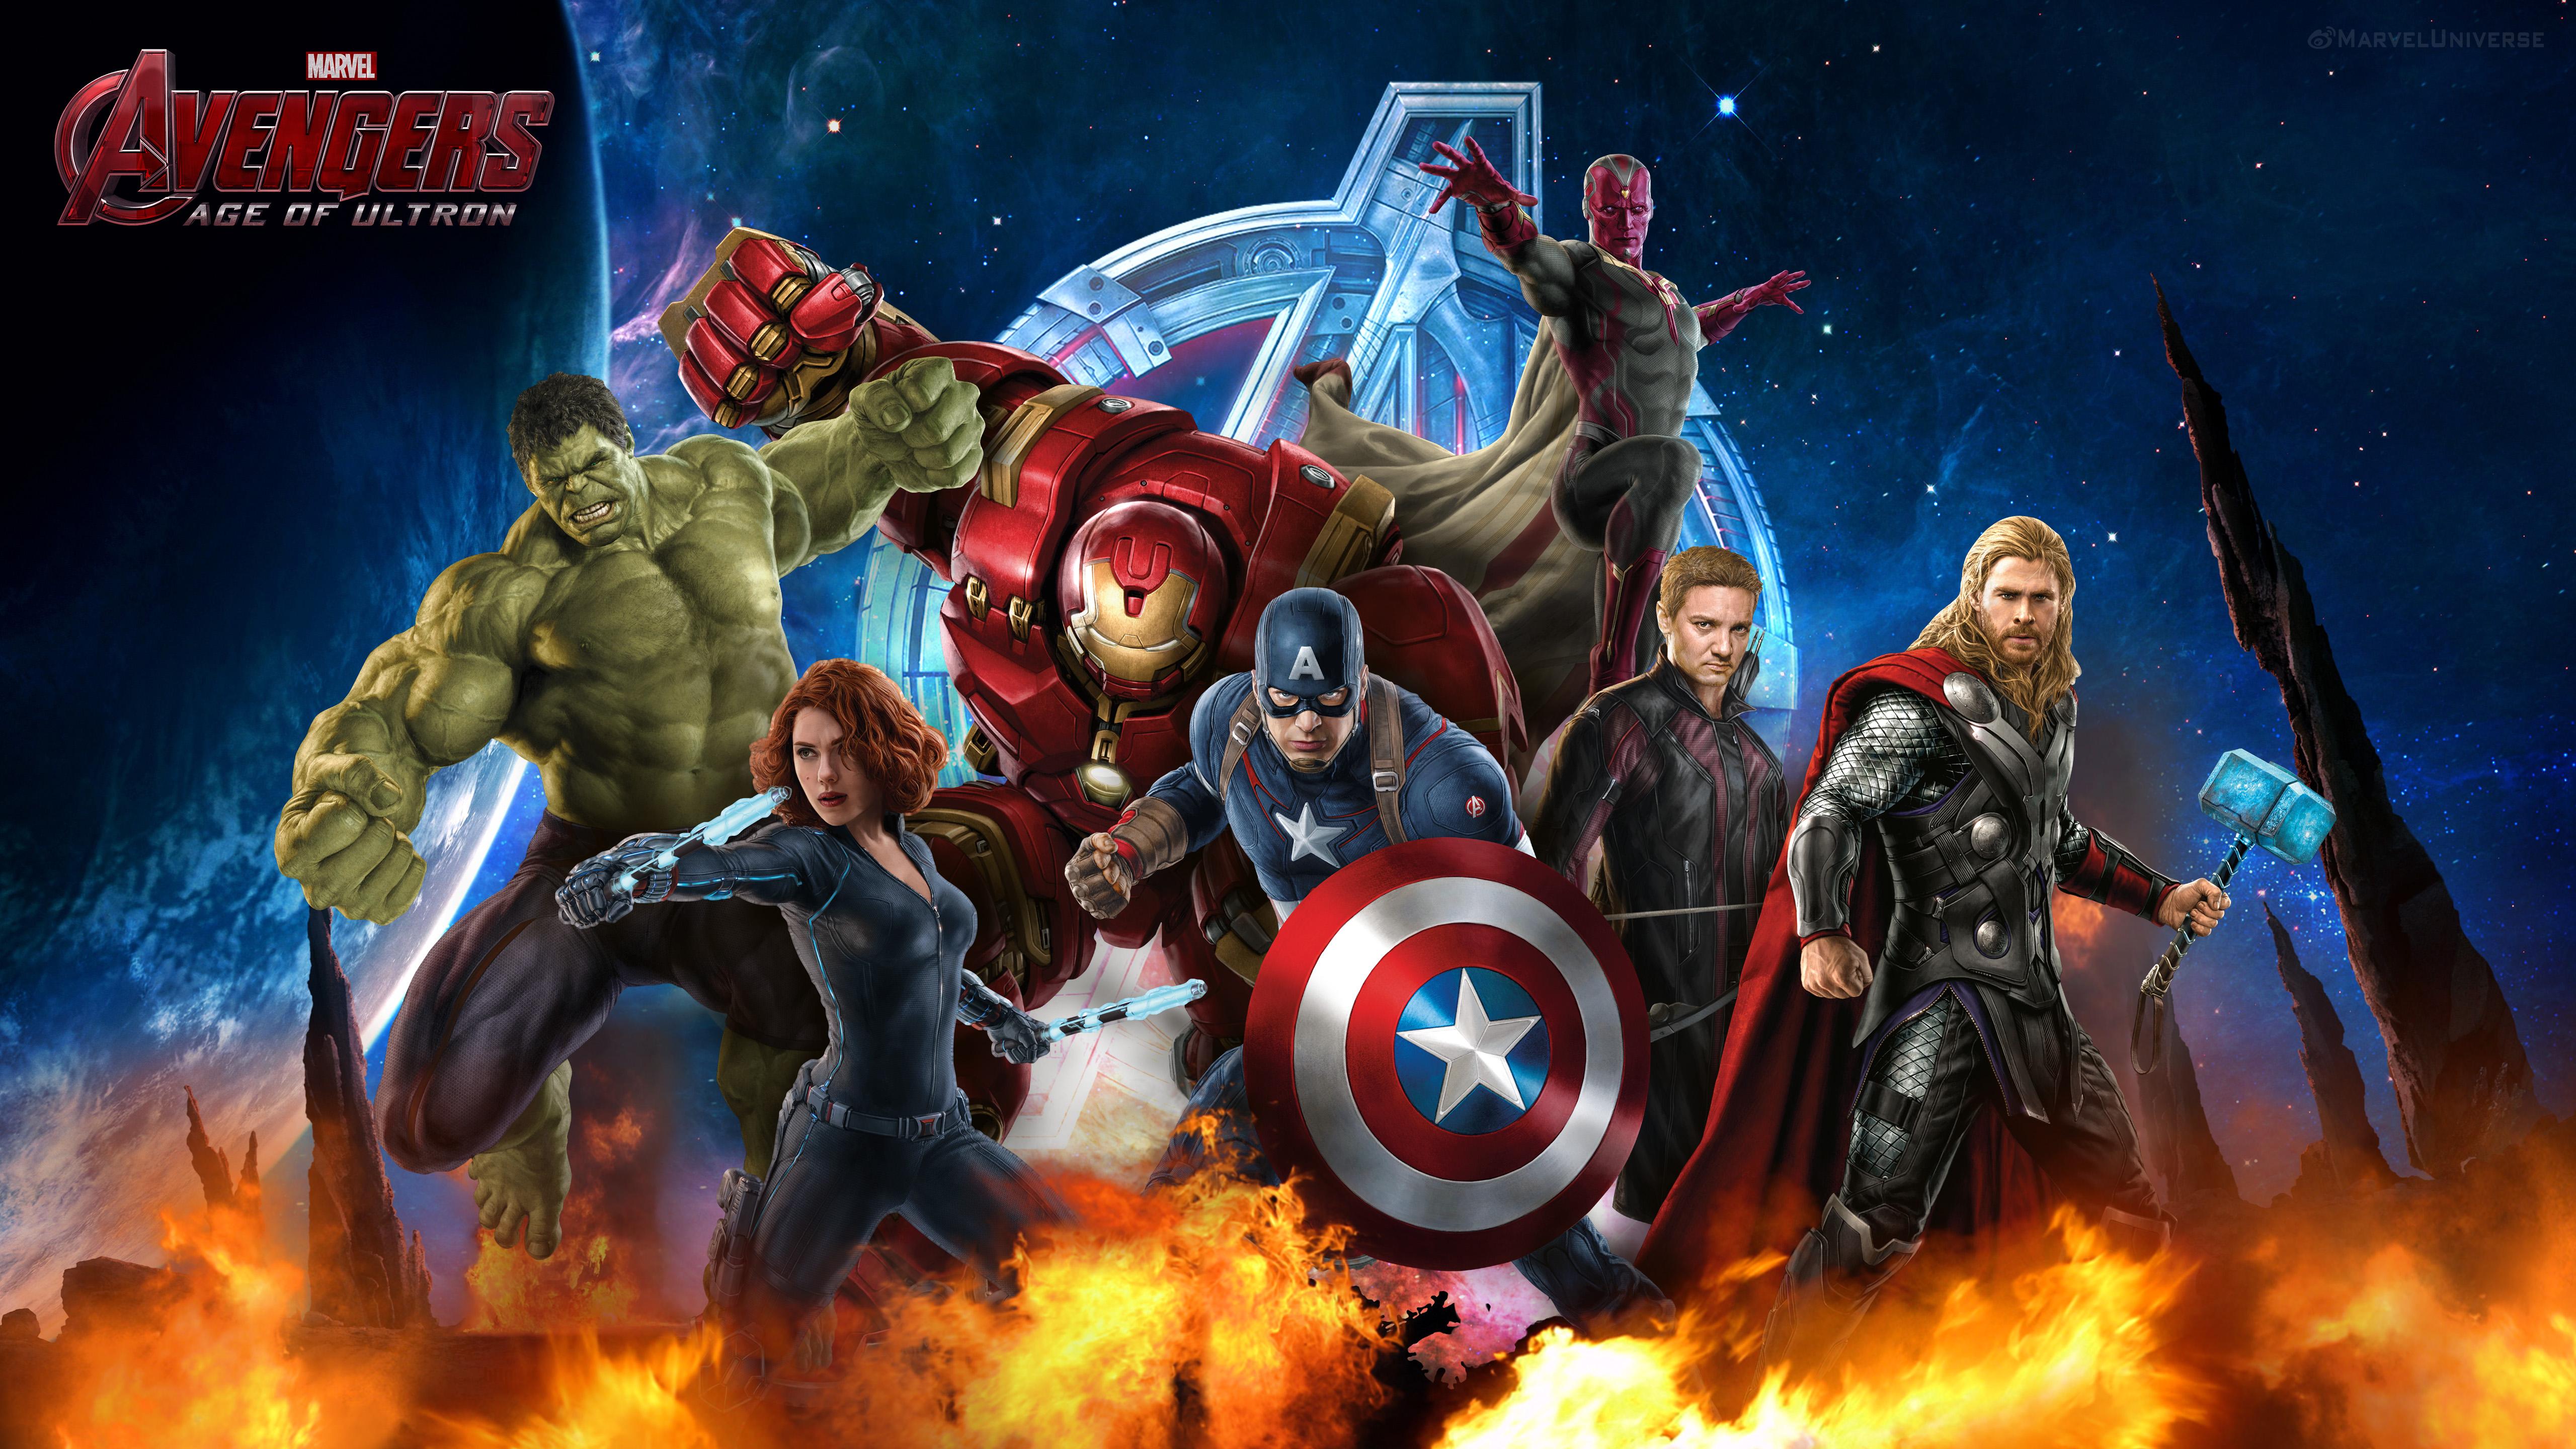 10 Avengers Comics You Should Read